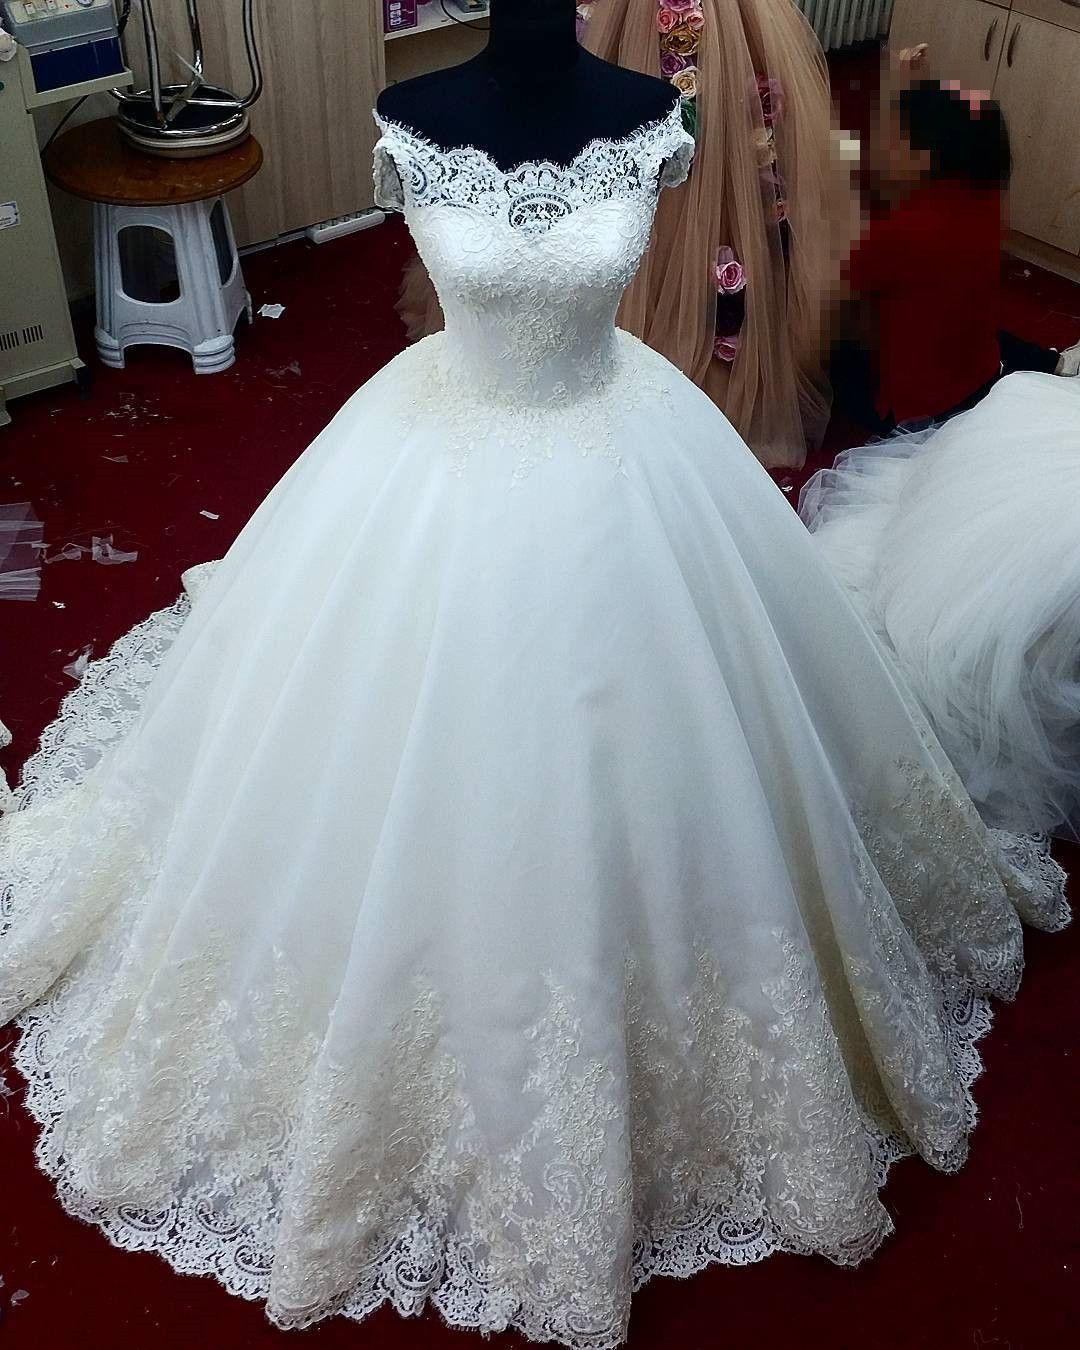 Vintage Wedding Gowns,Ball Gowns Wedding Dresses,Elegant Wedding ...